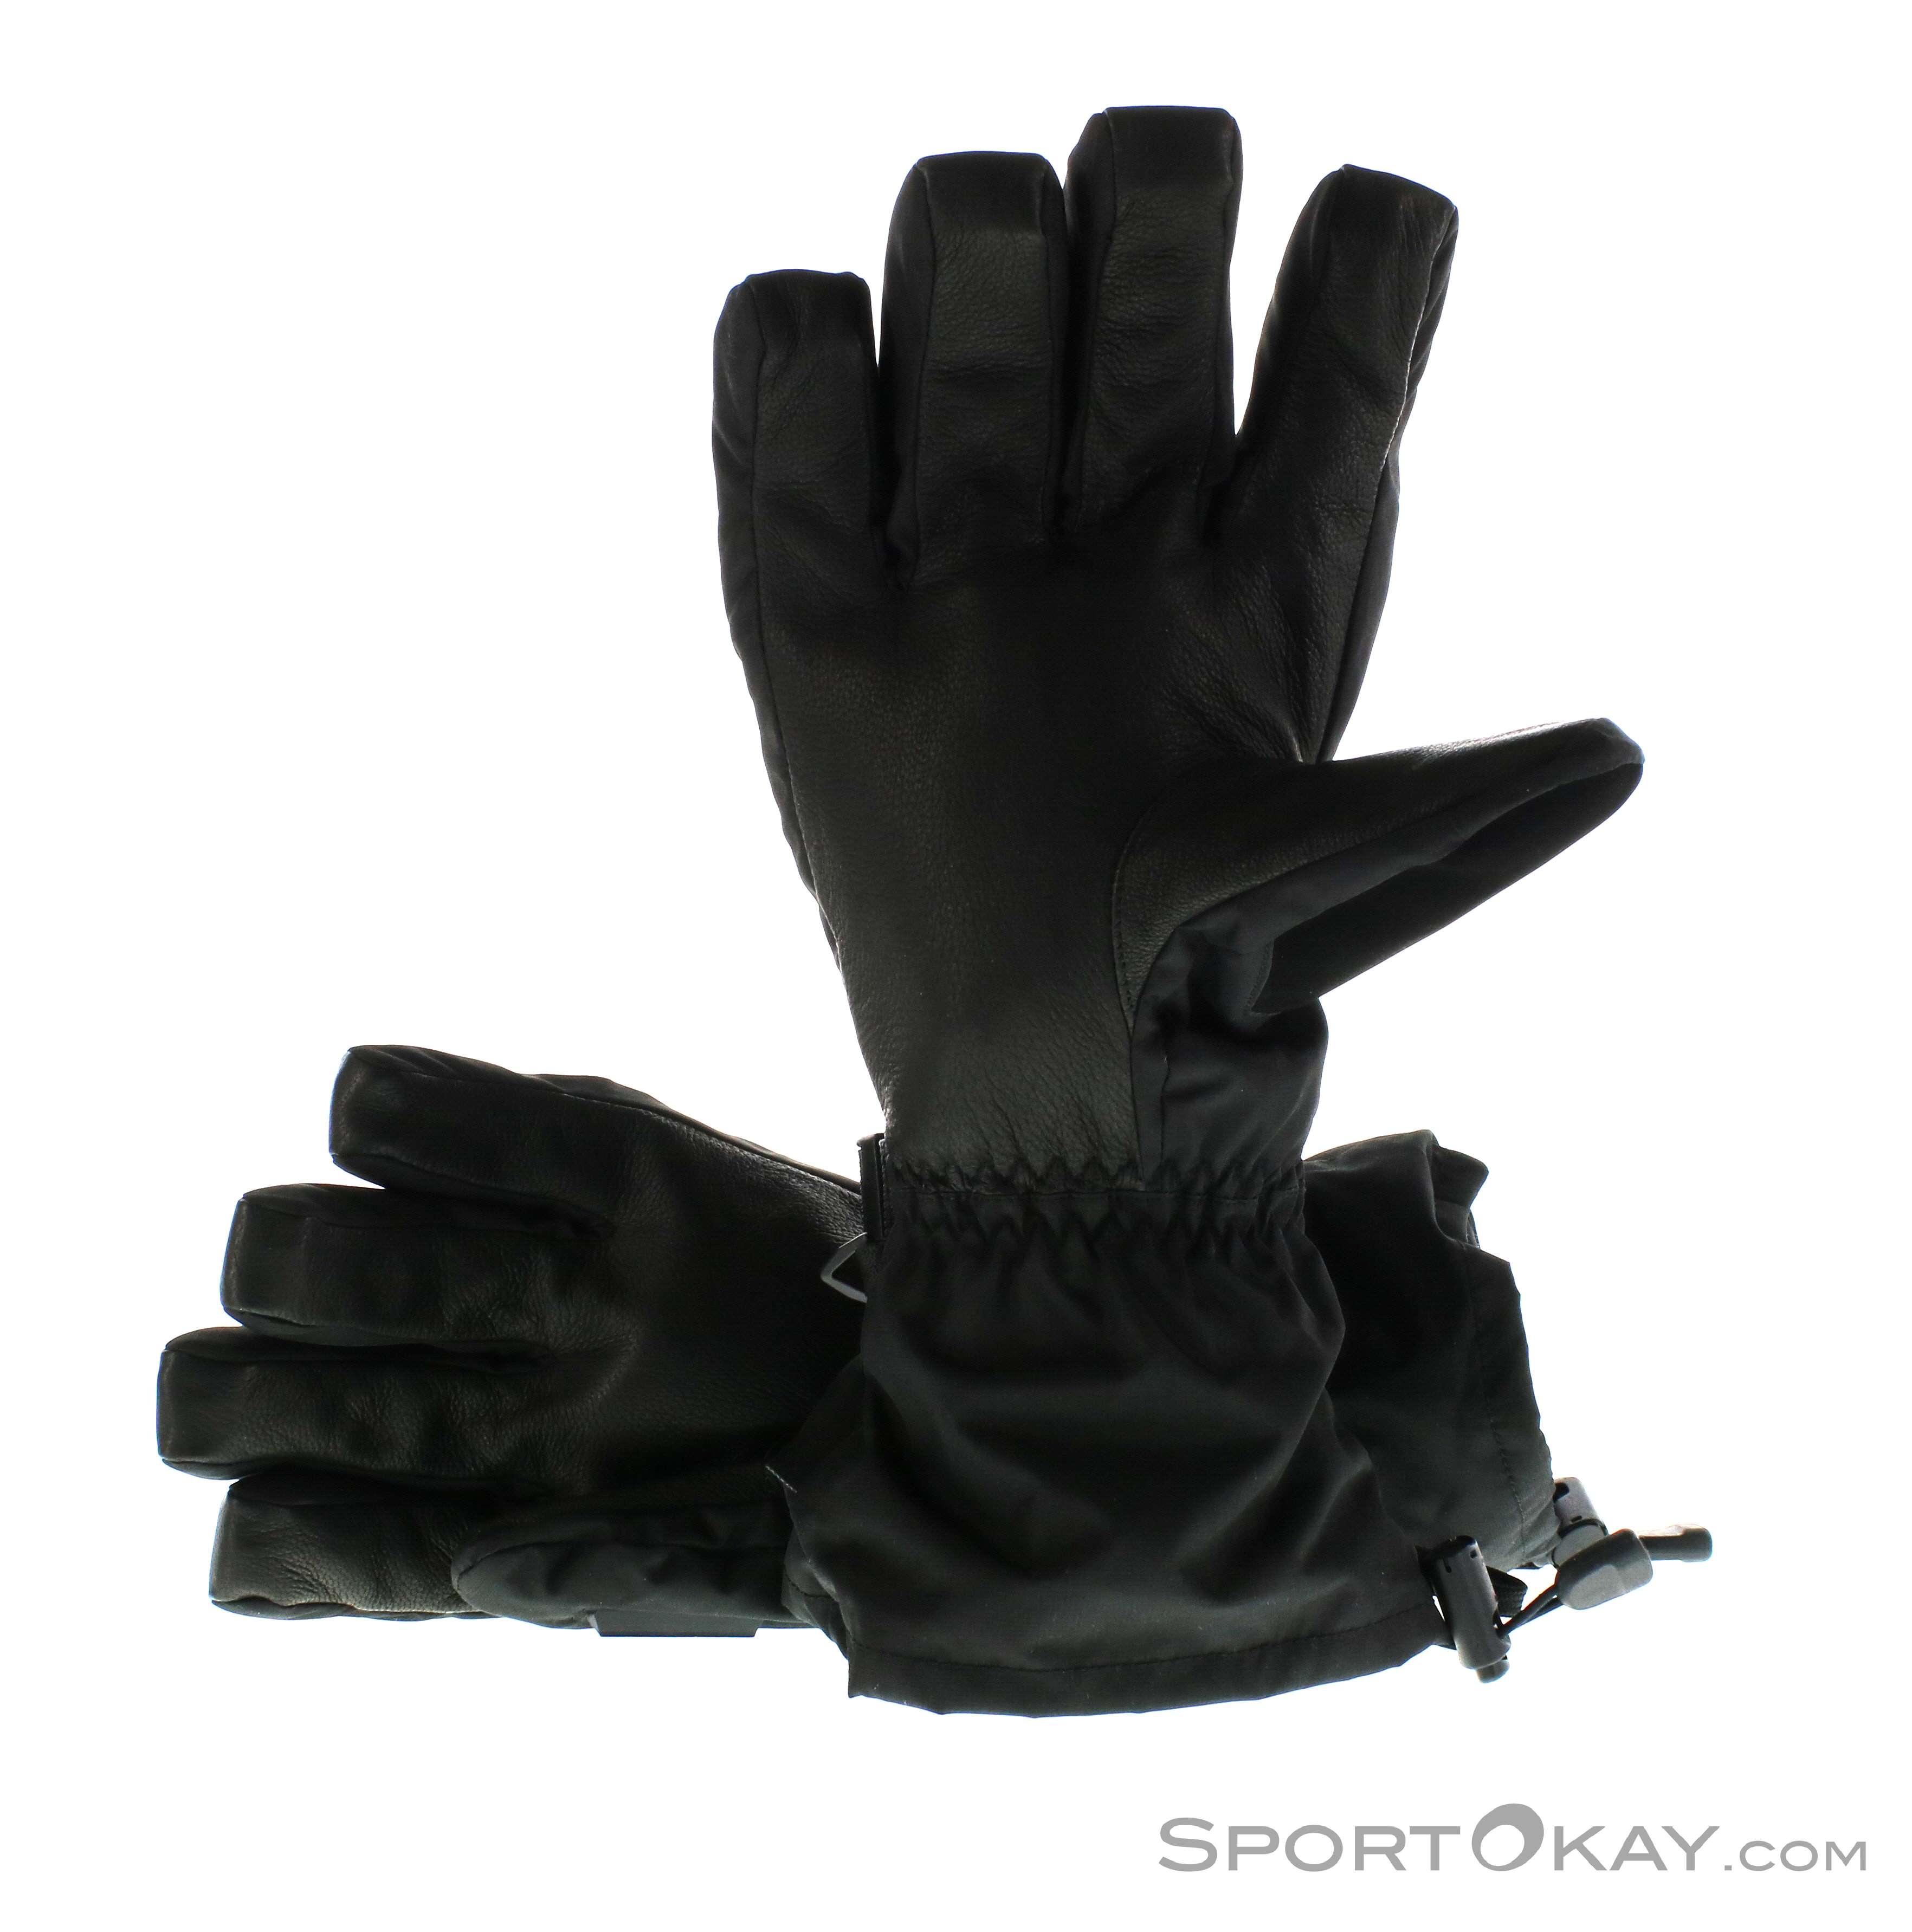 Dakine Scout Glove Leather Gloves Ski Clothing Black Male 0200 10147